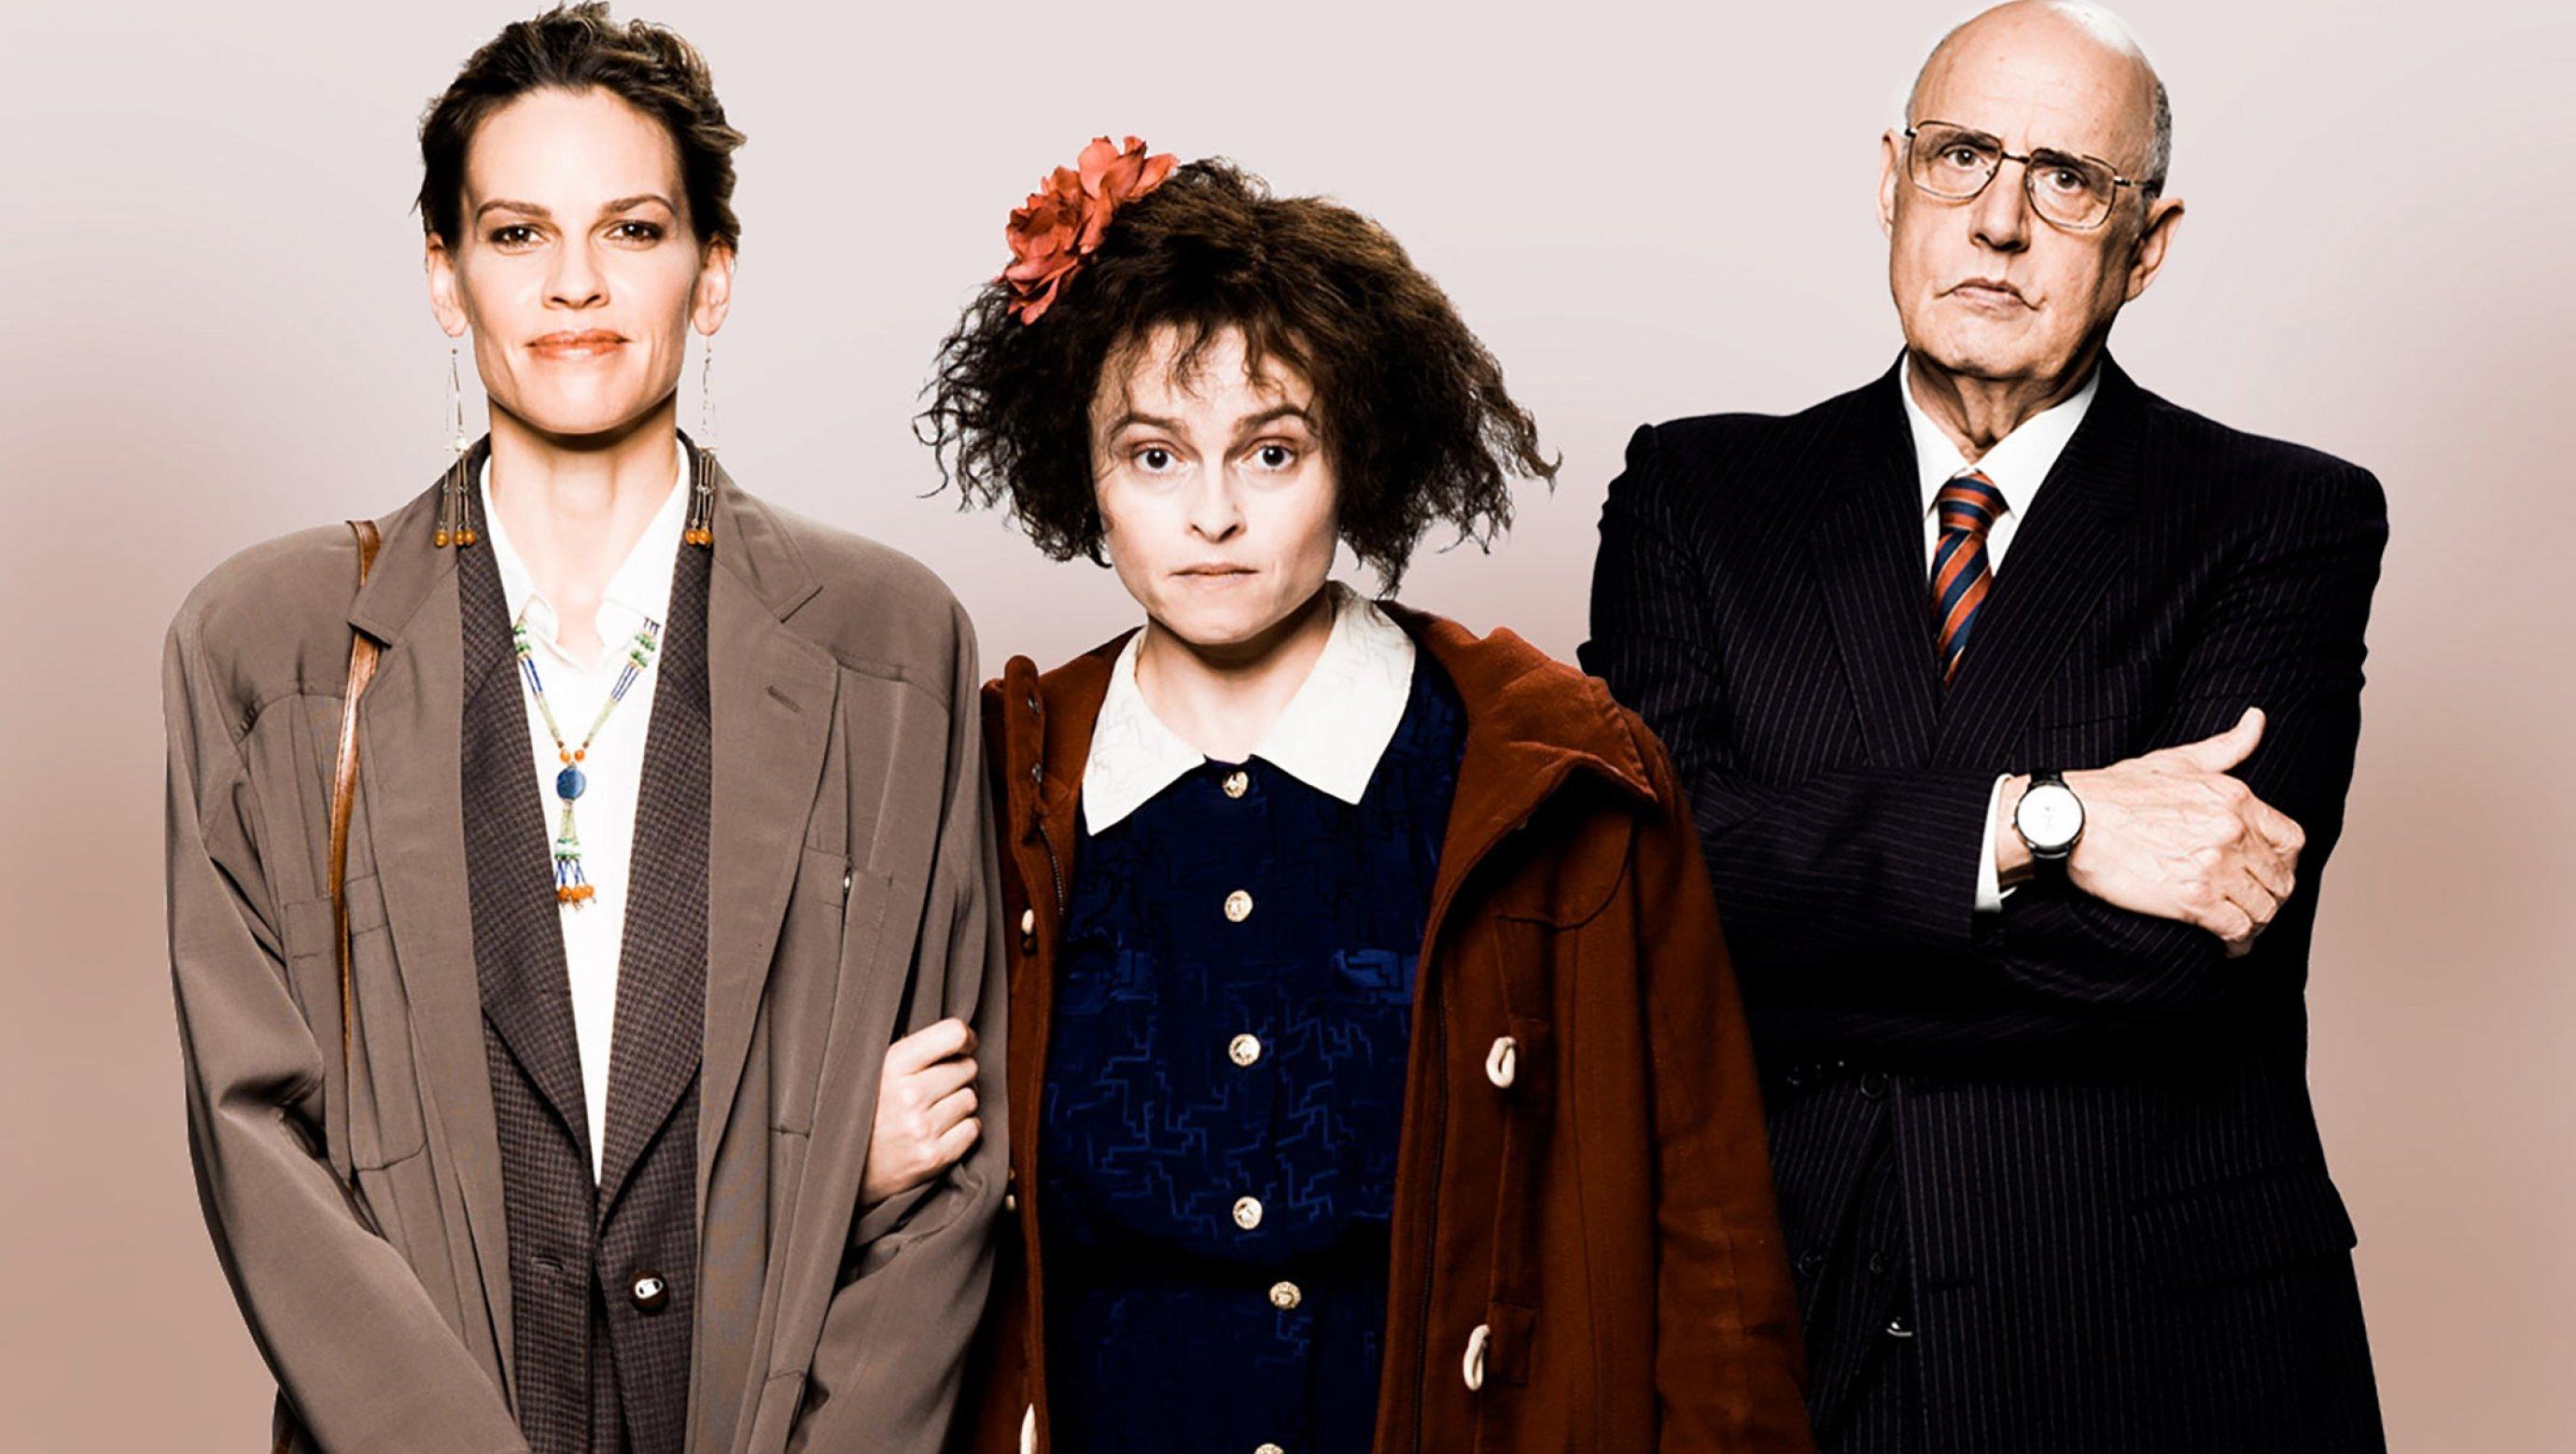 Helena Bonham Carter, Jeffrey Tambor, and Hilary Swank in 55 Steps (2017)